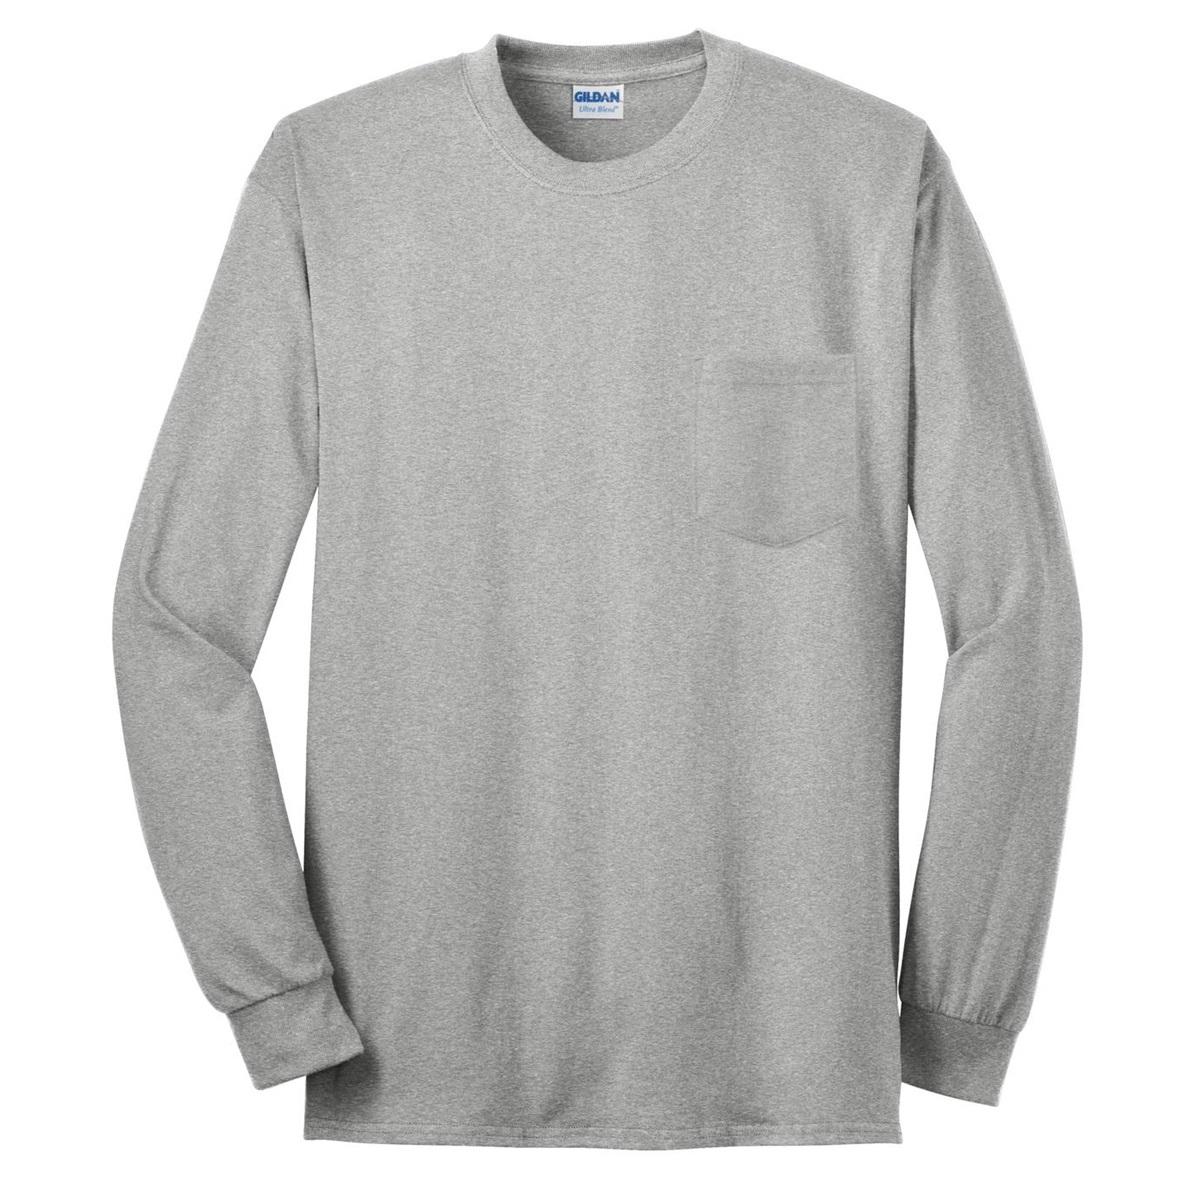 Gildan 2410 ultra cotton long sleeve t shirt with pocket for Long sleeve pocket shirts